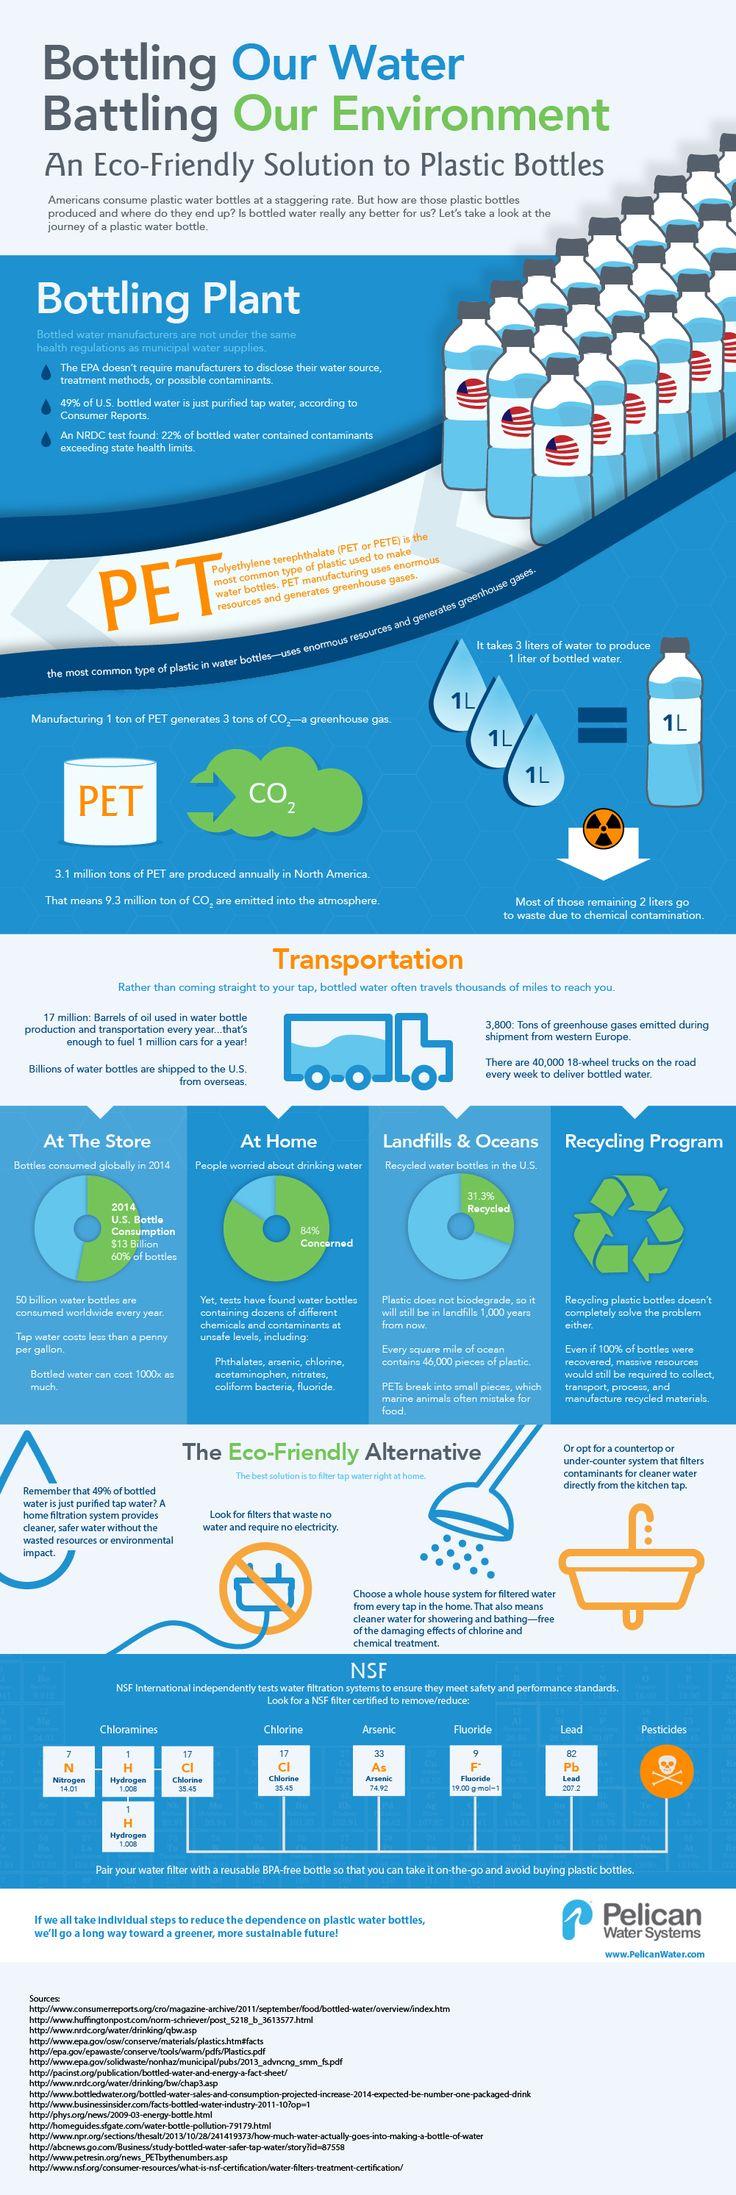 25 best Community Resources images on Pinterest | Pdf, Composting ...